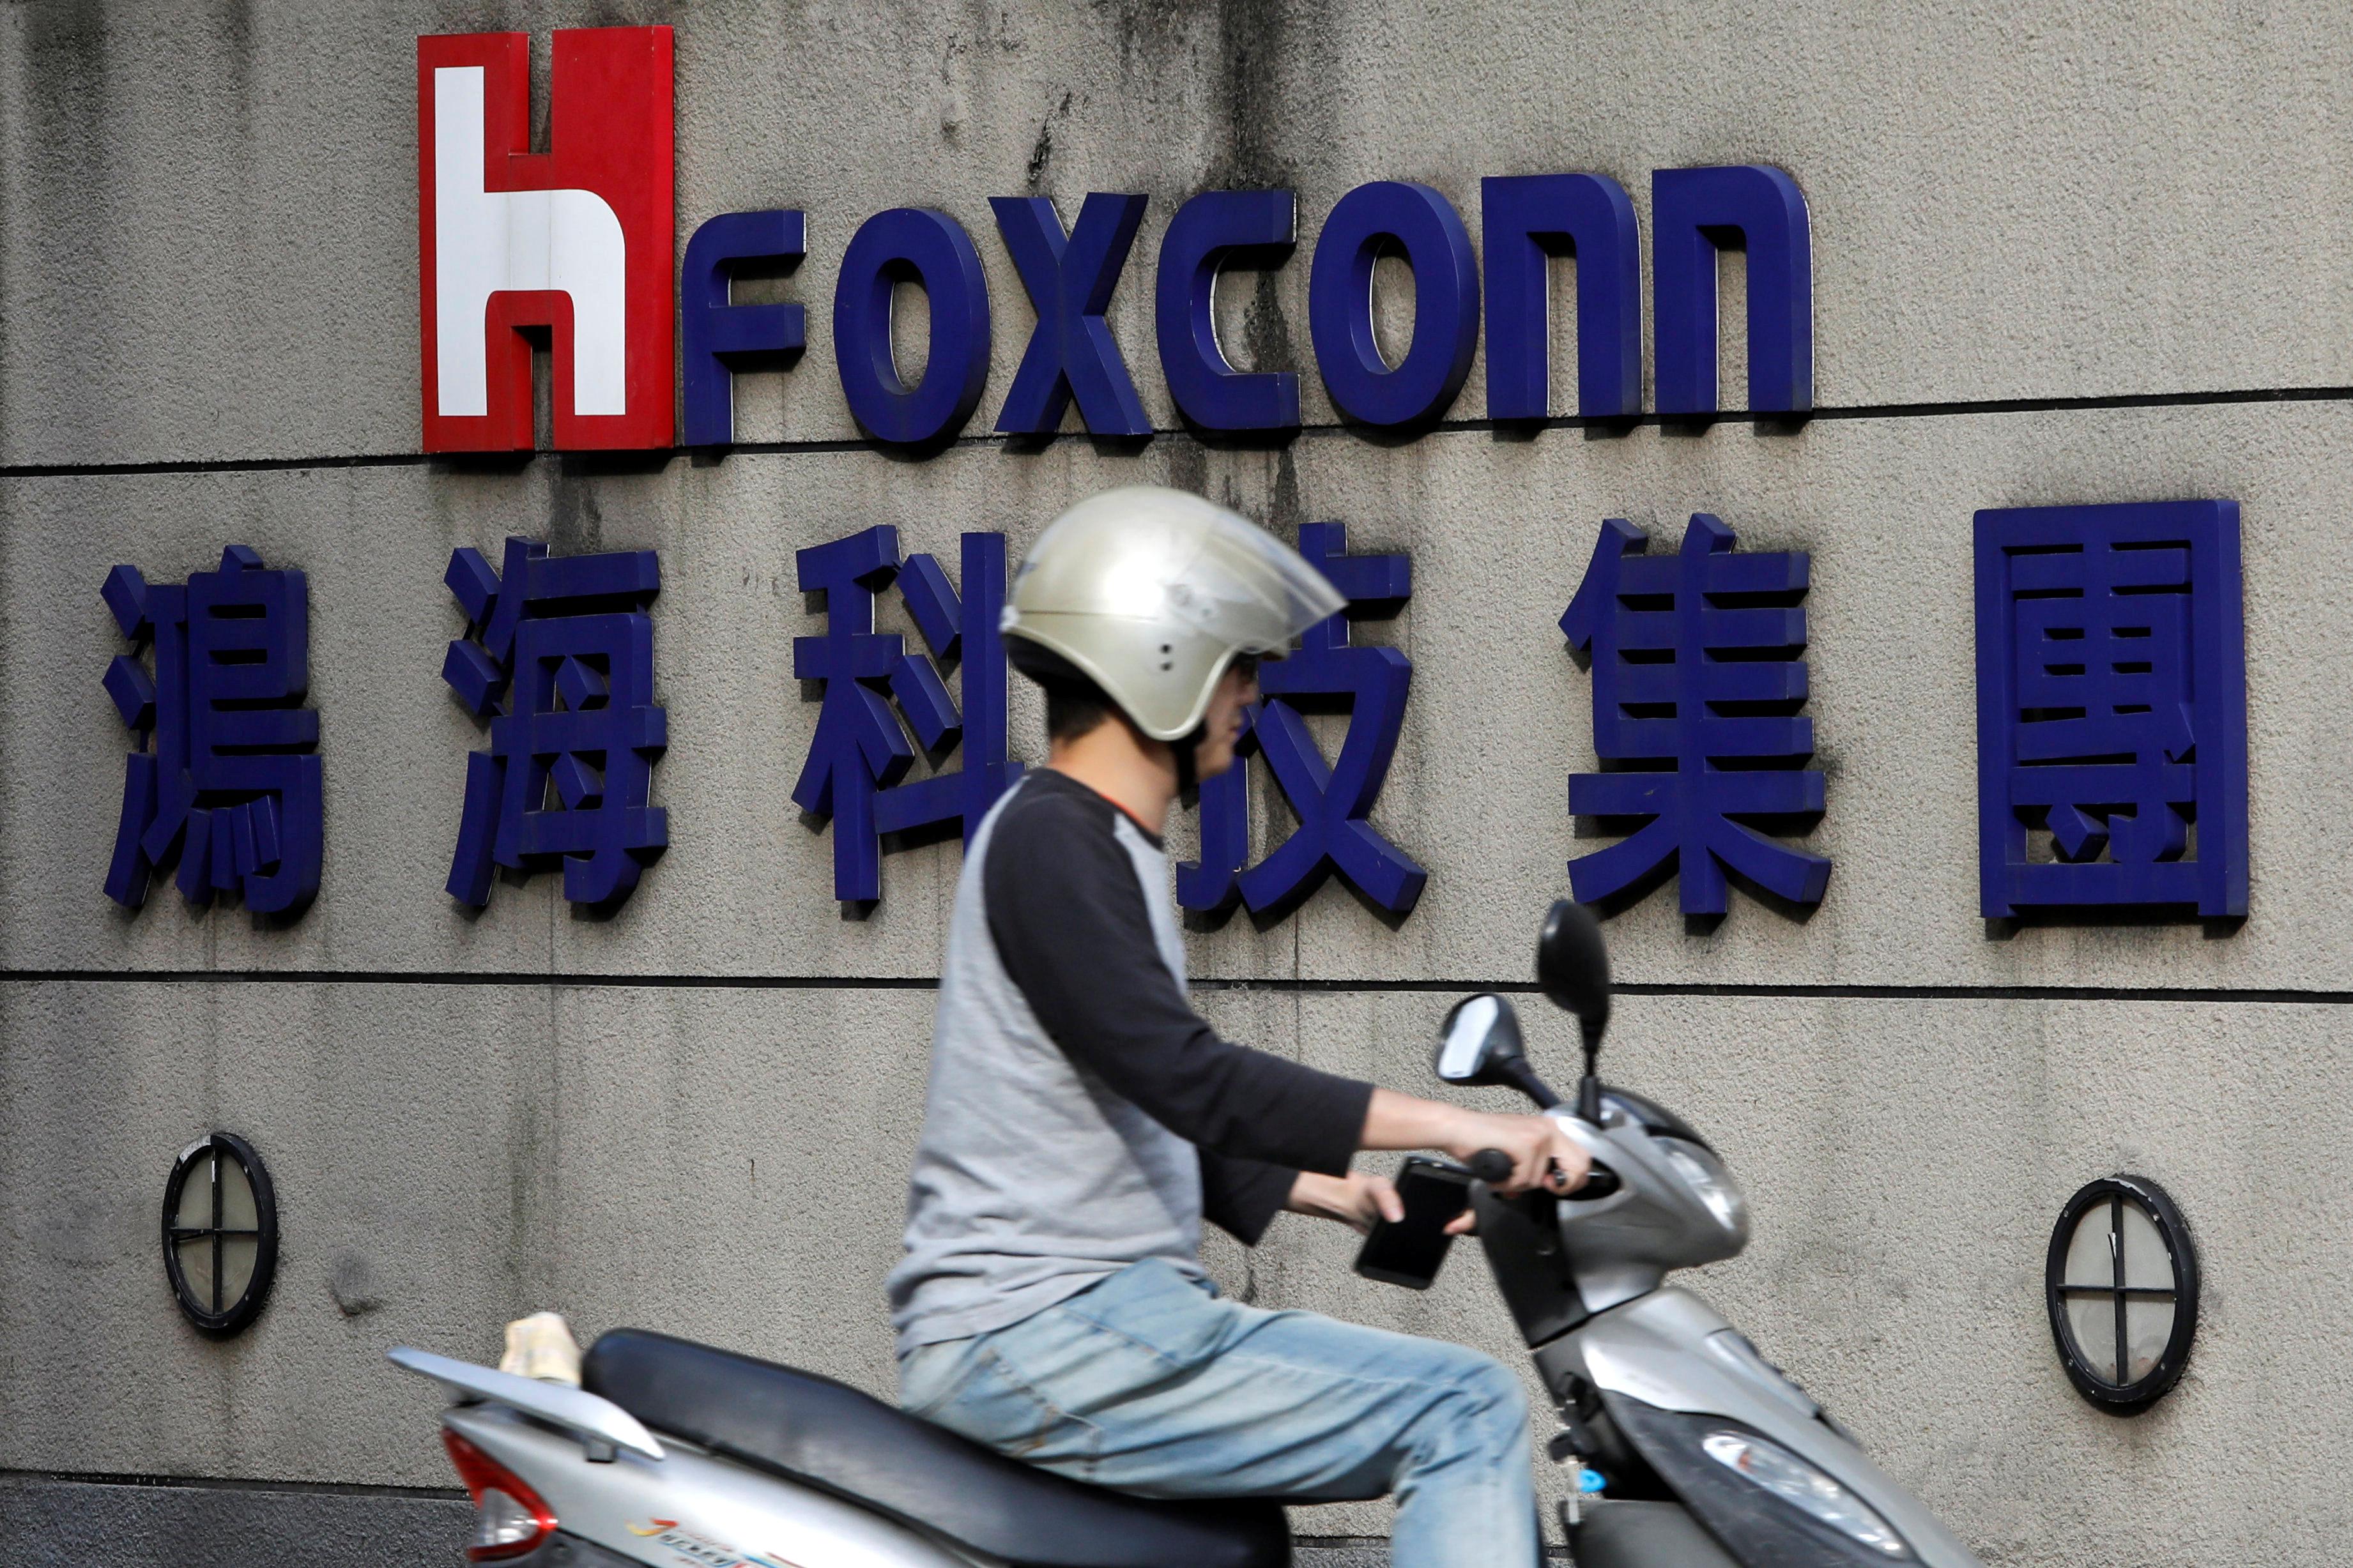 Foxconn Eyes Sale of $8.8 Billion China Plant Amid Trade War Woes